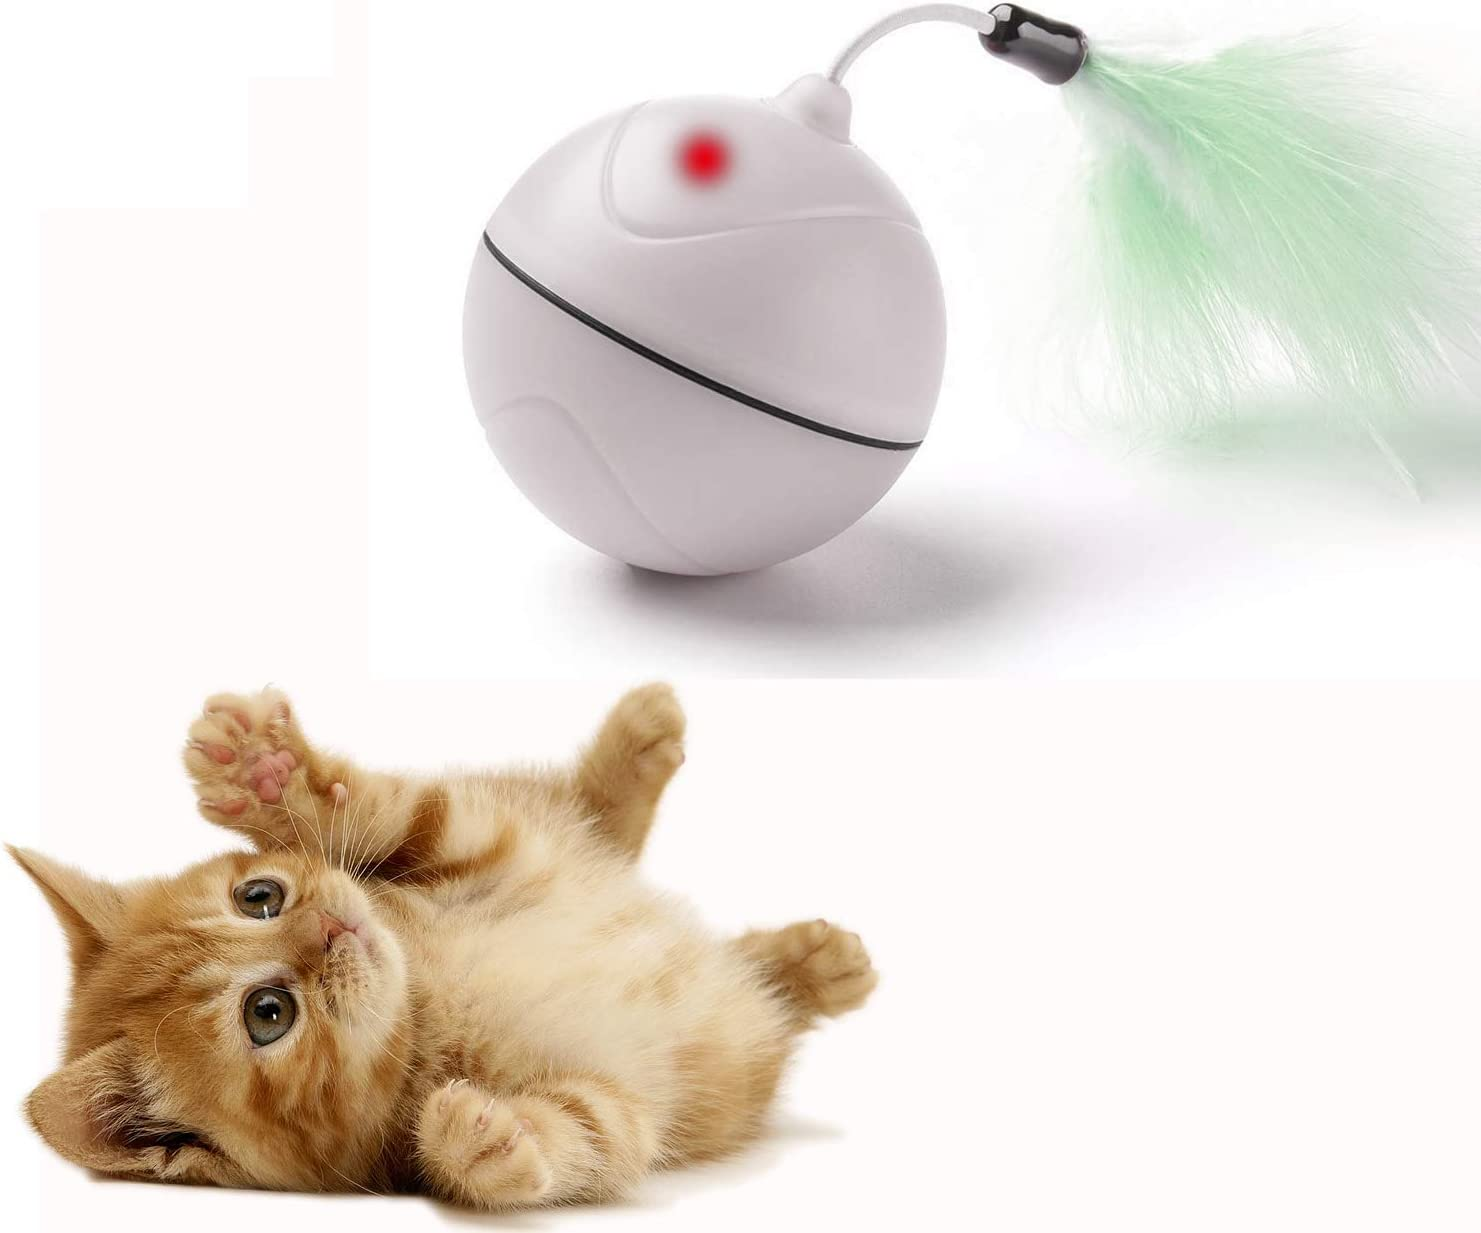 Bola de Carga USB automática para Juguetes para Gatos con luz interactiva interactiva y entretenida para Juguetes con Pluma Desmontable para Gatitos - batería Recargable: Amazon.es: Productos para mascotas